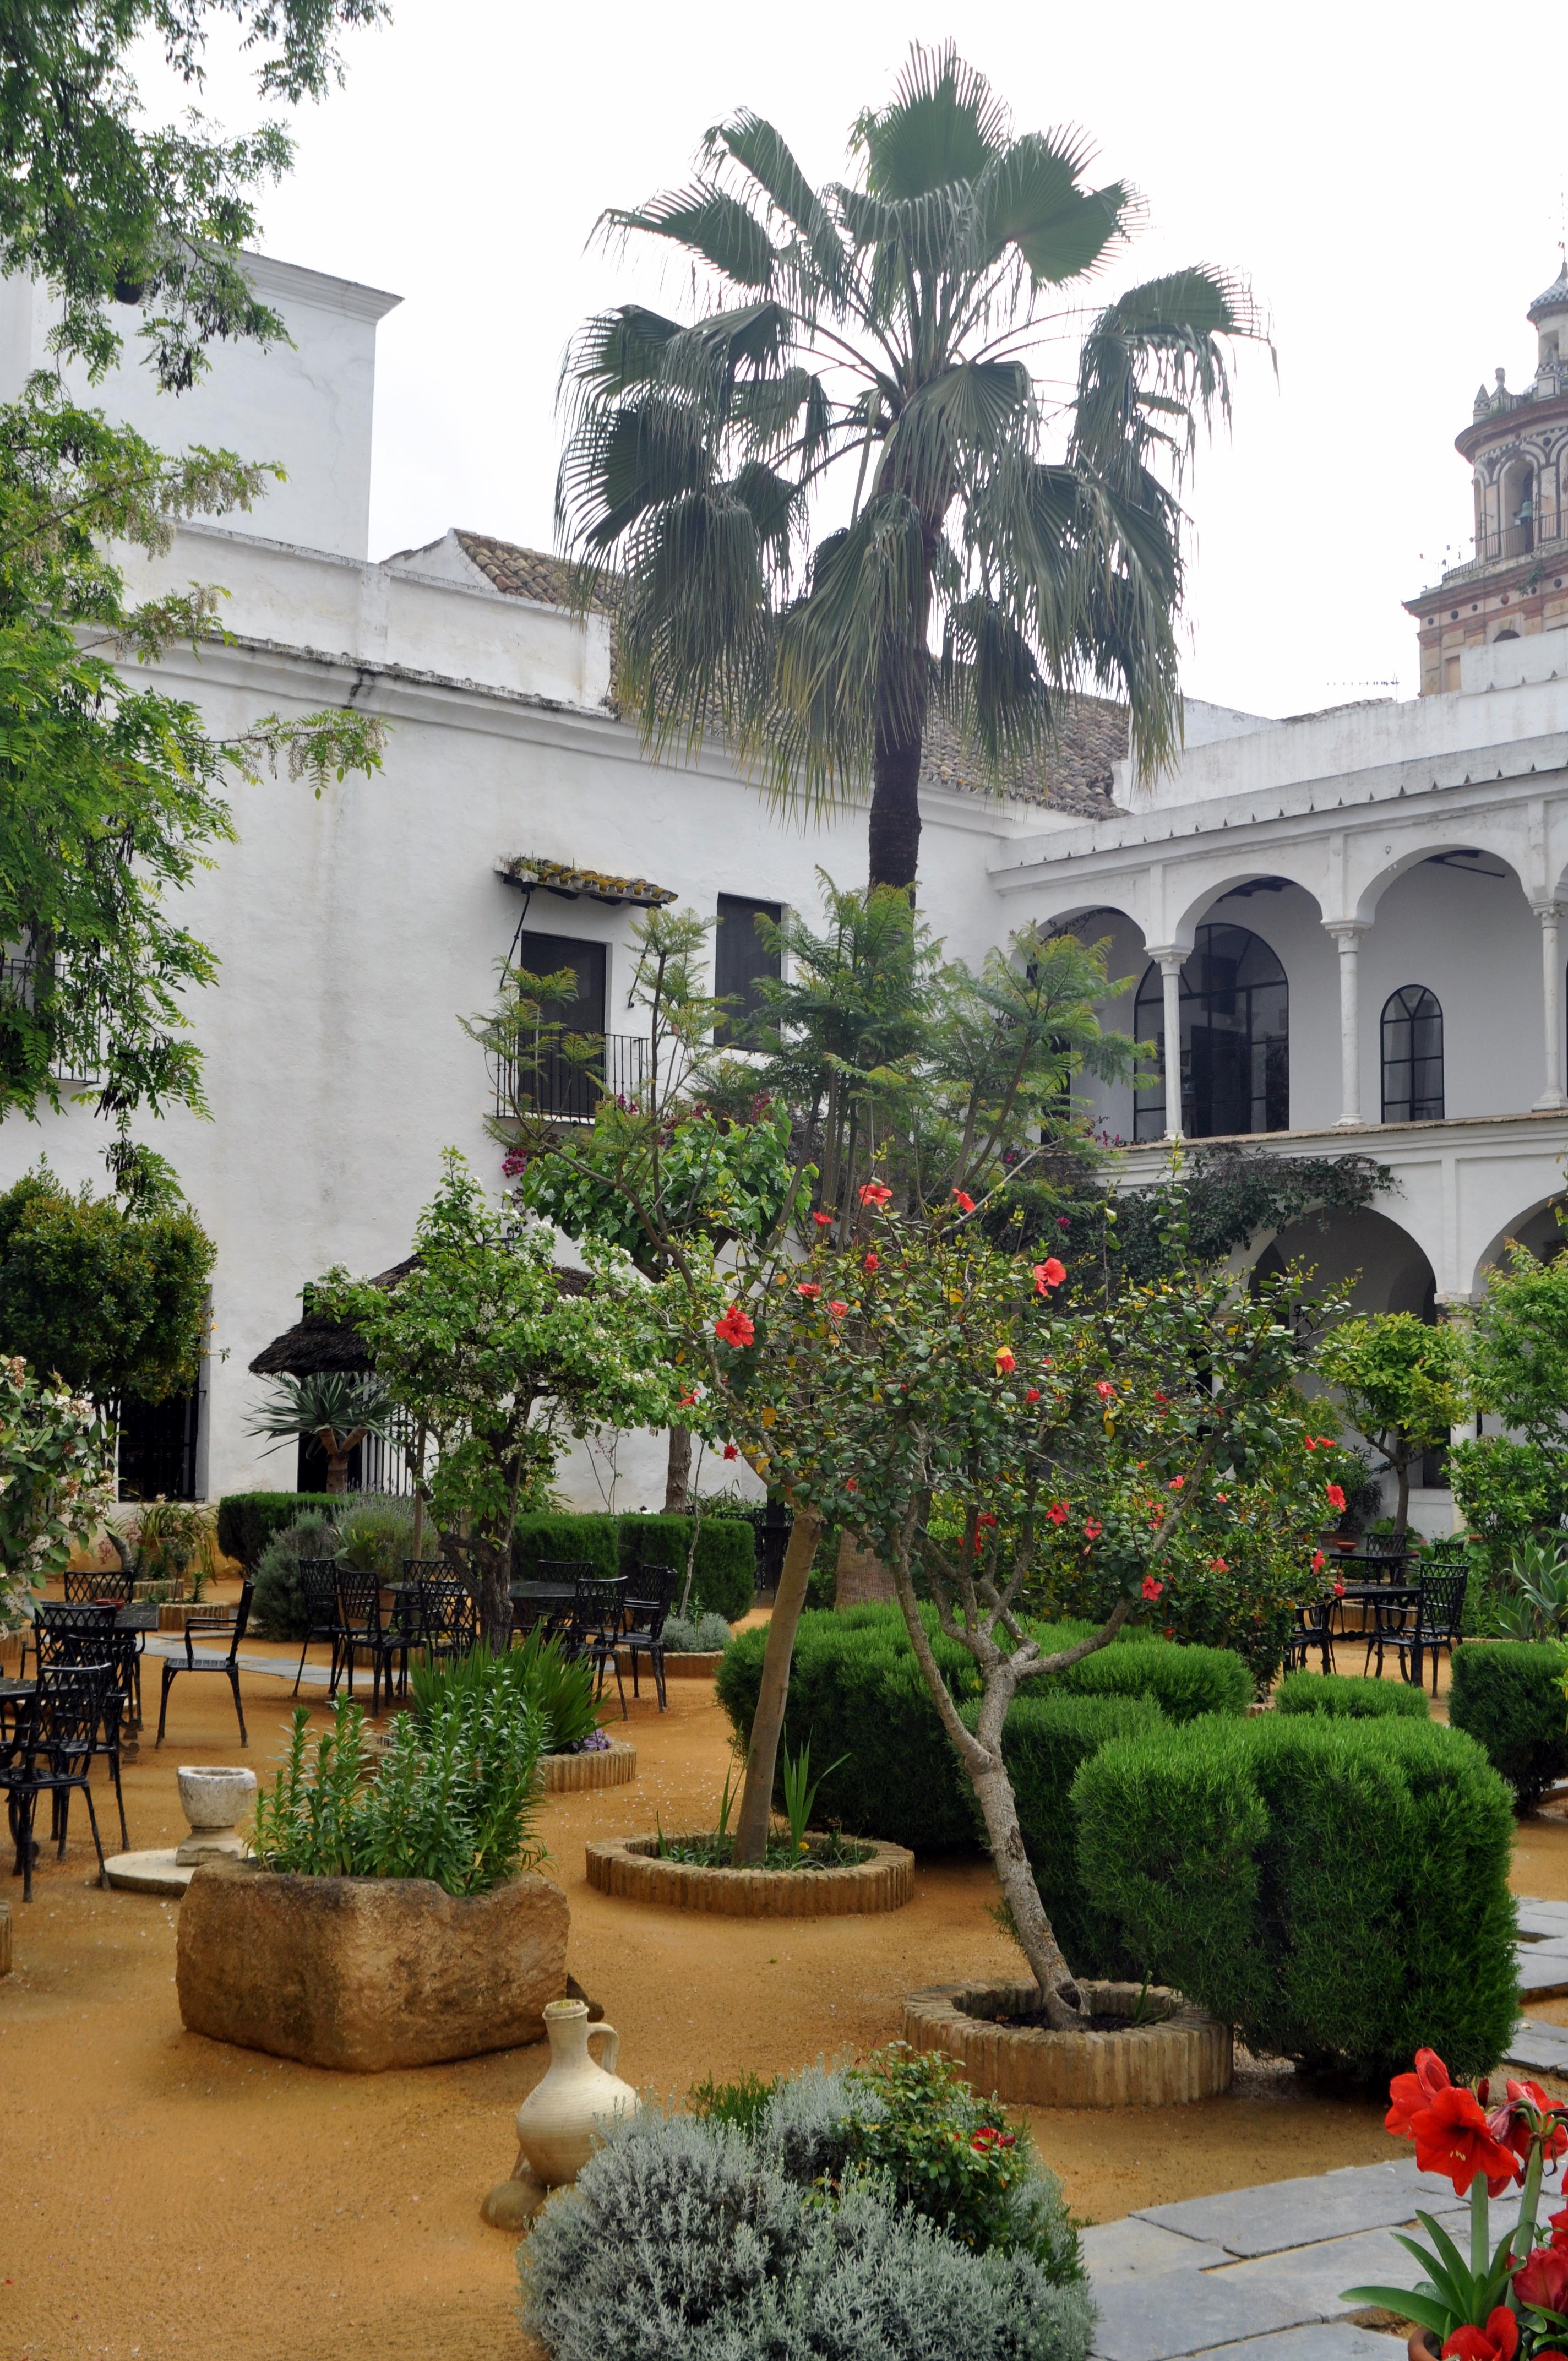 File jardines palacio medina sidonia jpg wikimedia commons for Arboles de jardin de hoja perenne